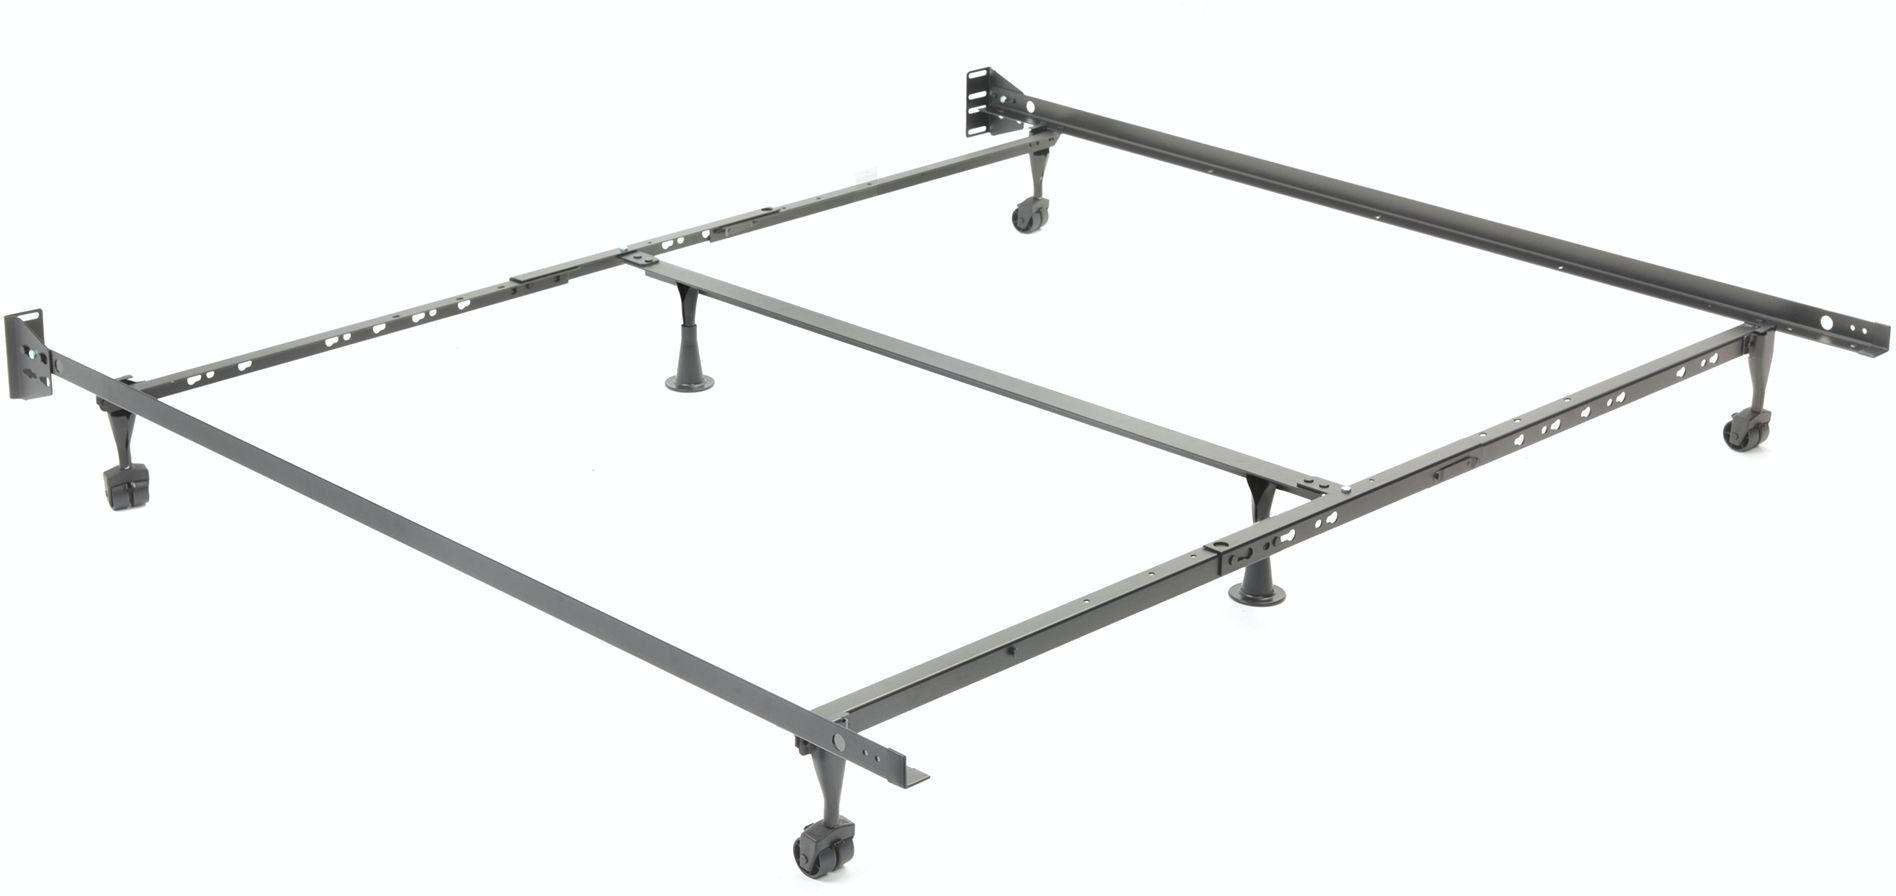 Fashion Bed Group Mattresses Adjust A Matic U36r Universal Bed Frame